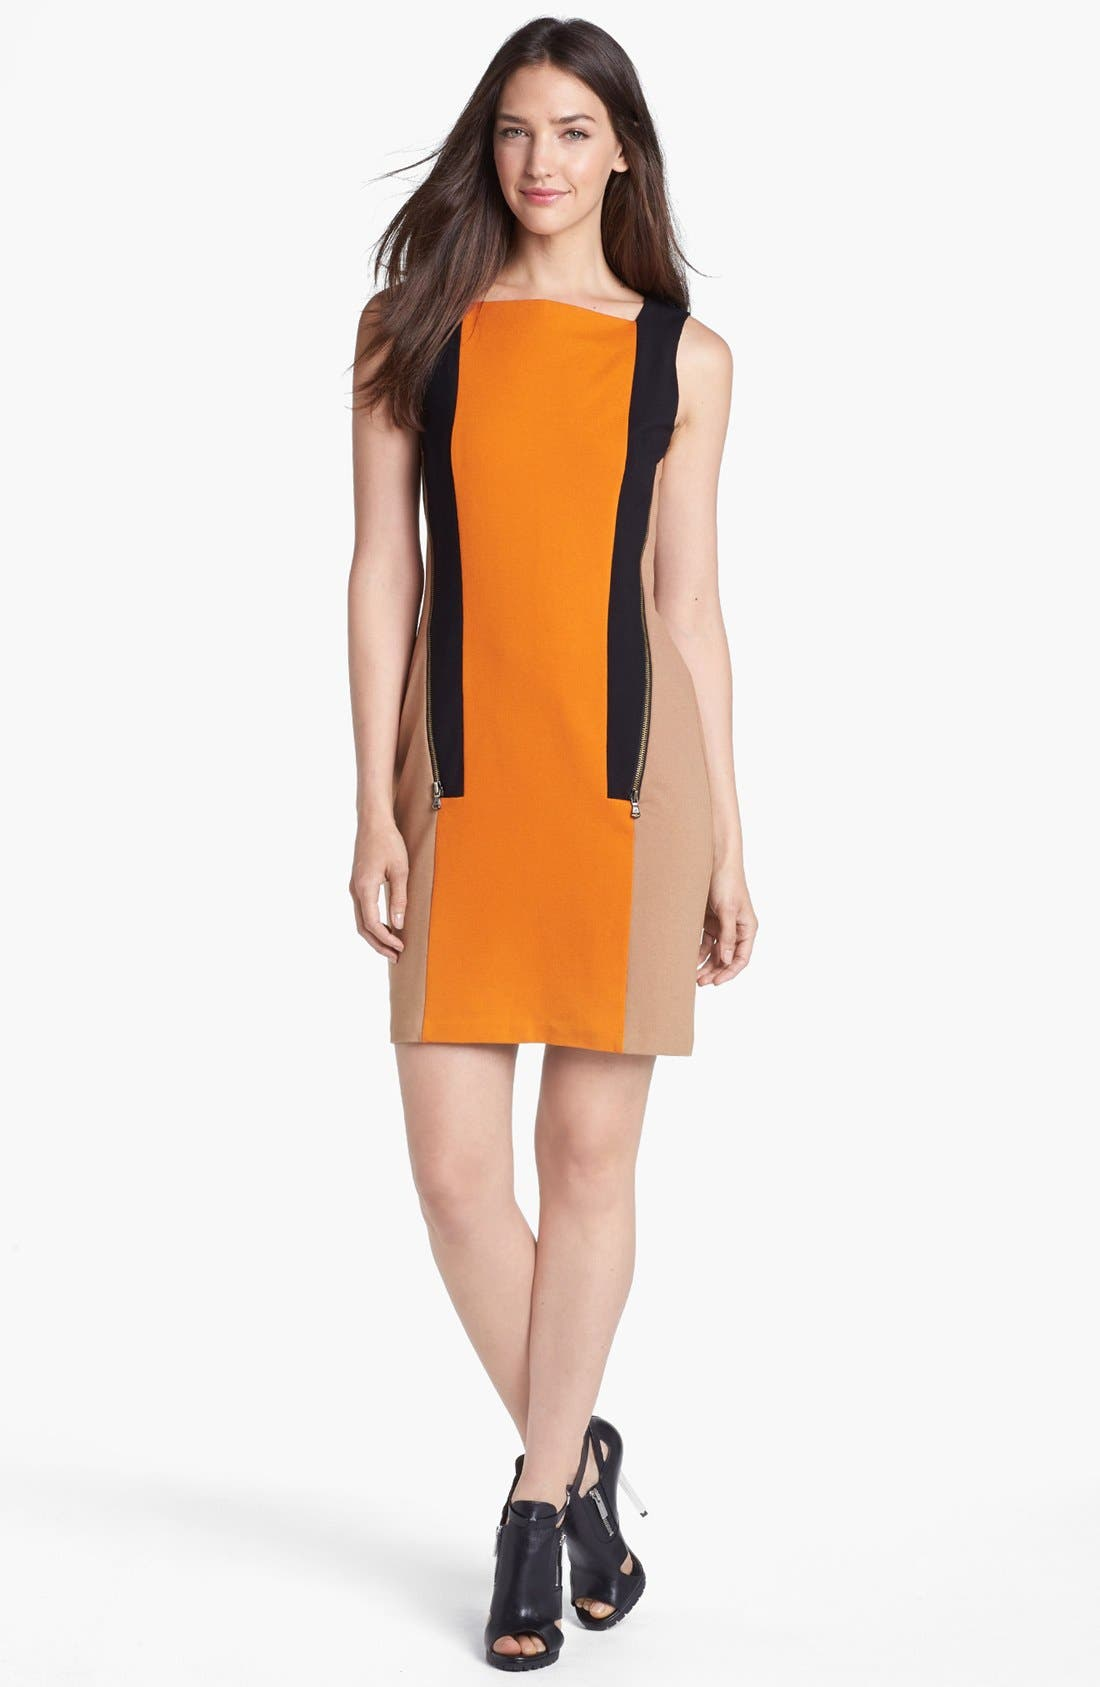 Alternate Image 1 Selected - Kenneth Cole New York 'Hulda' Zip Colorblock Dress